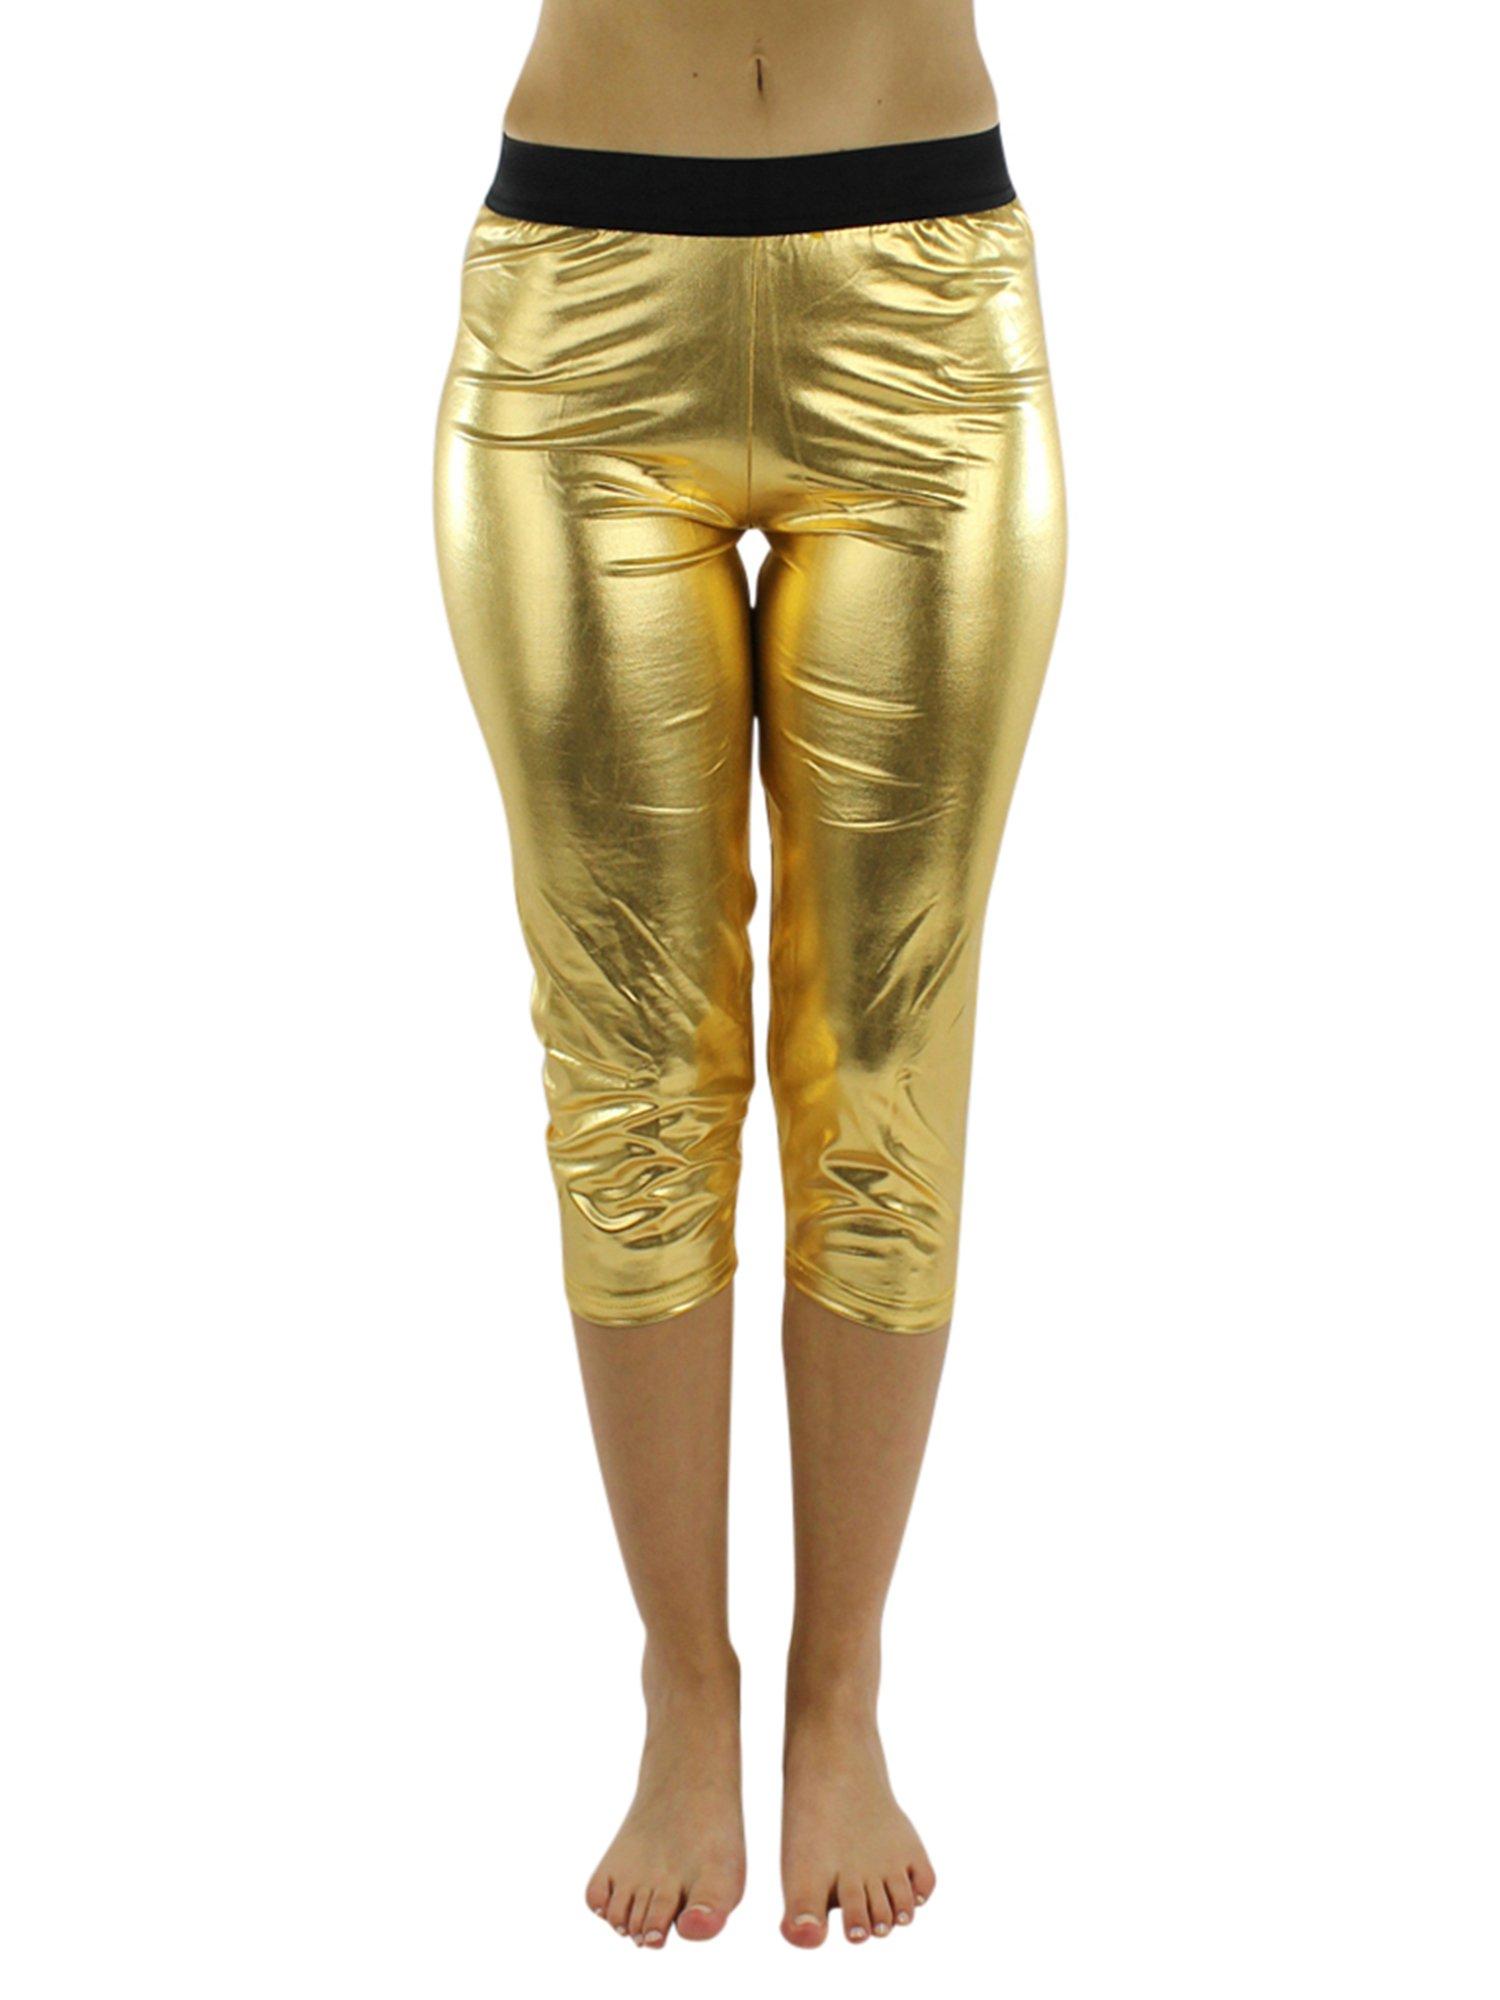 Gold Metallic Foil Capri Style Stretchy Leggings